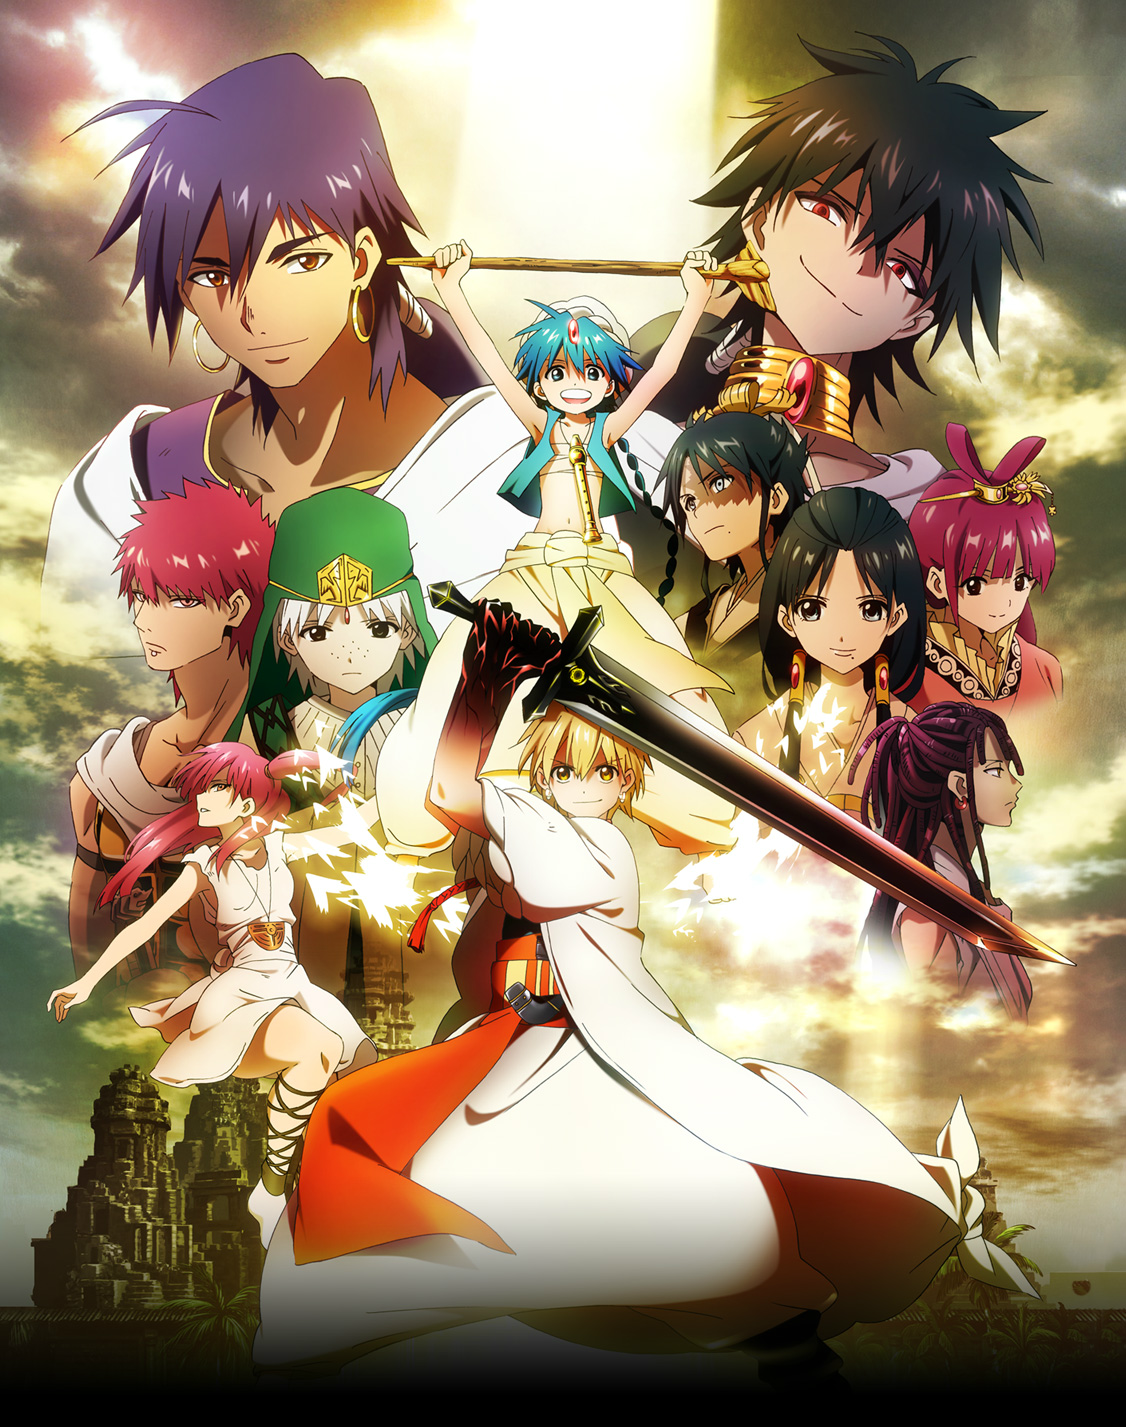 Magie Anime Serien